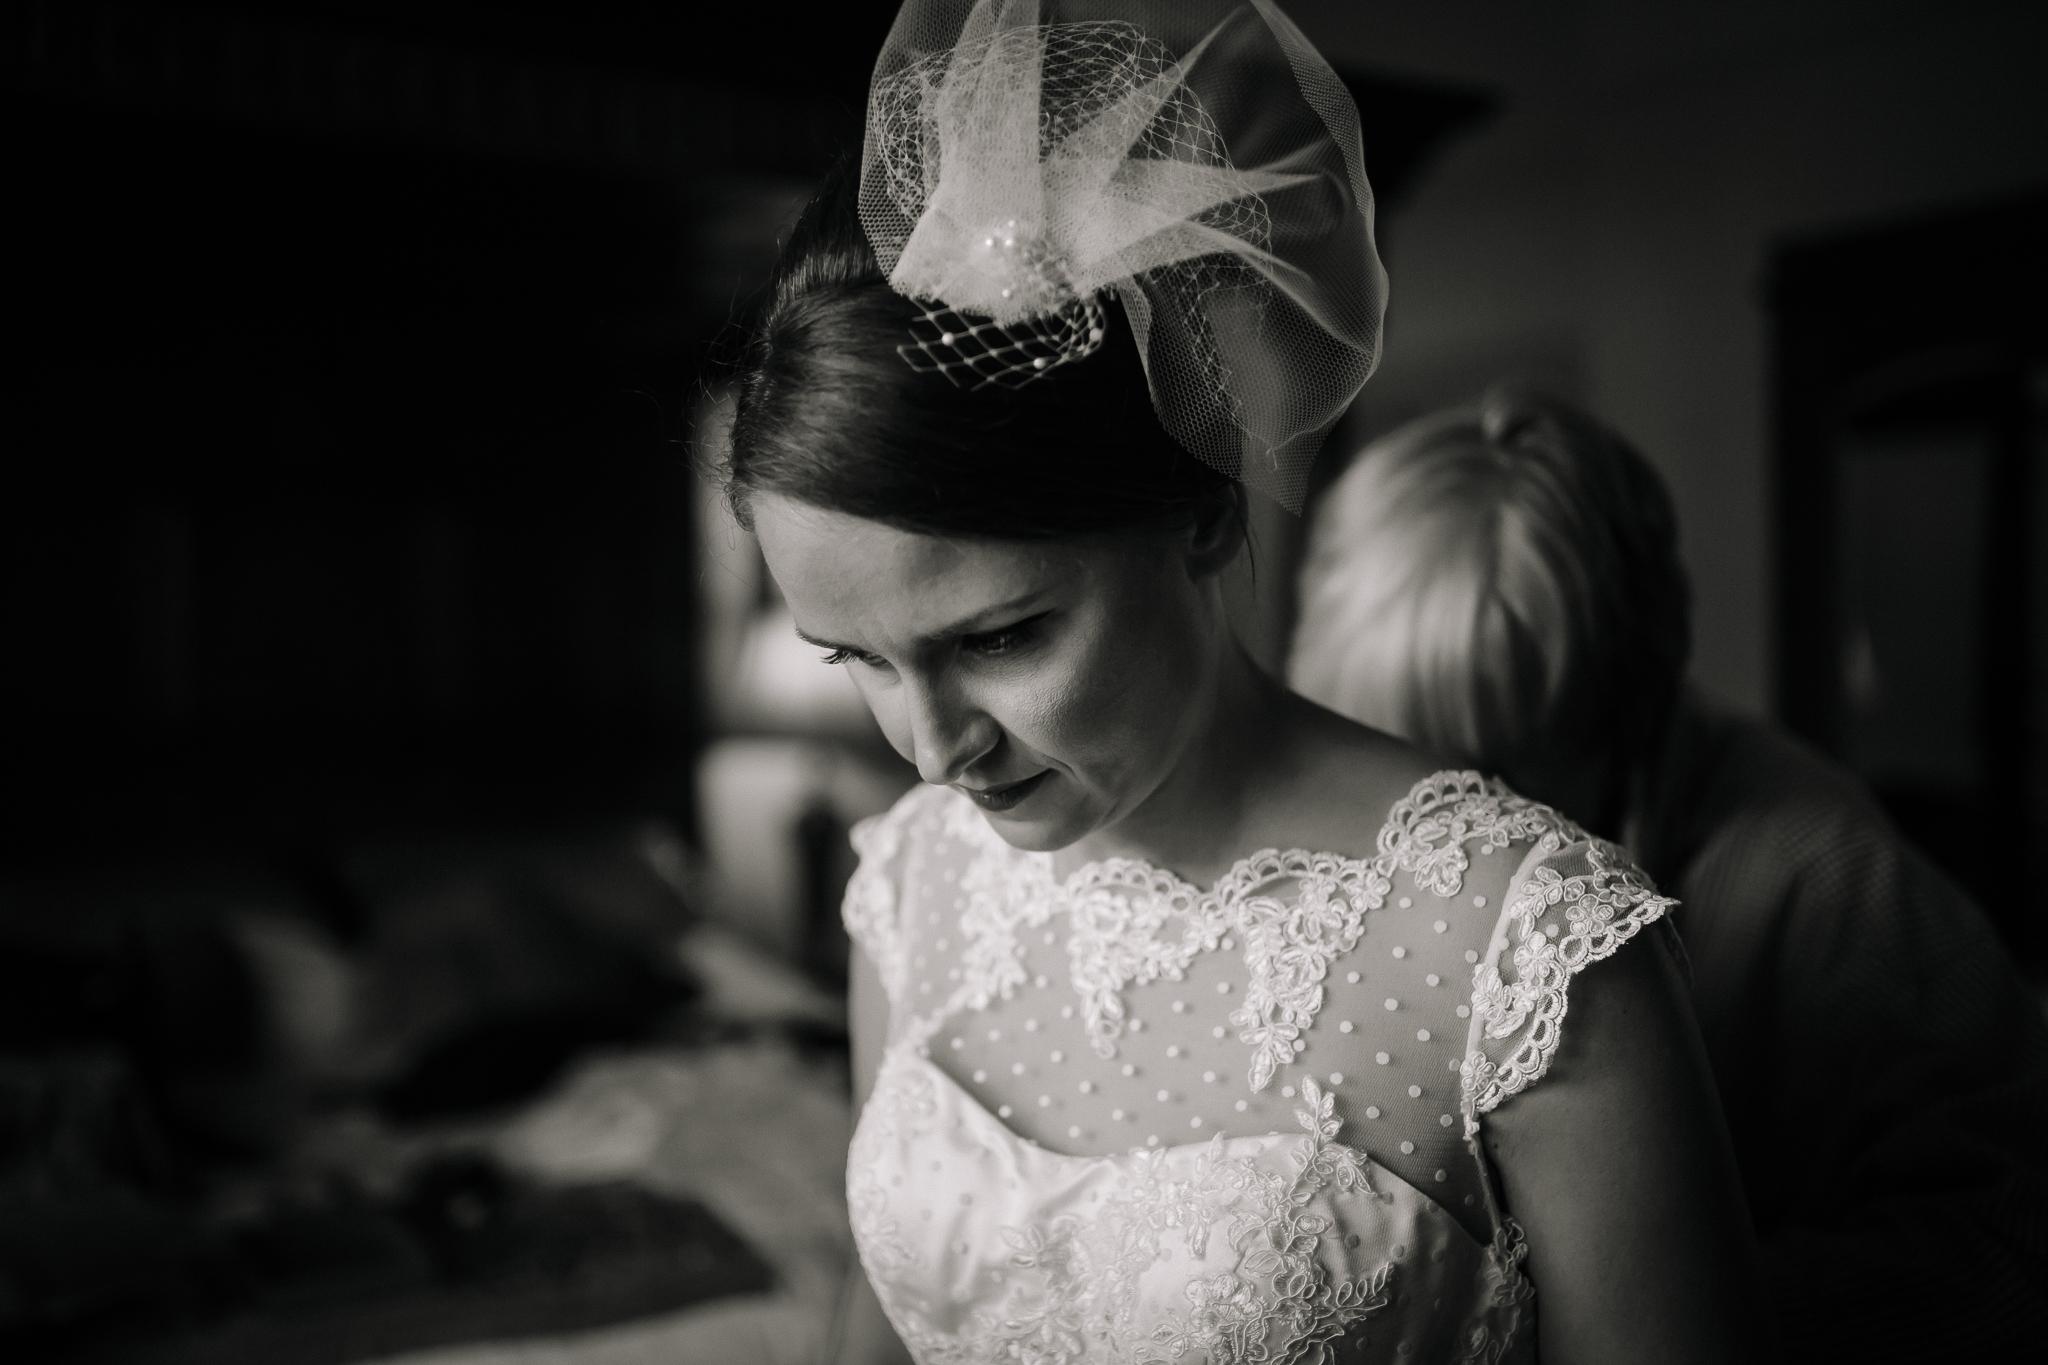 Morganna Monk Photography 190223 IMG_1448.jpg